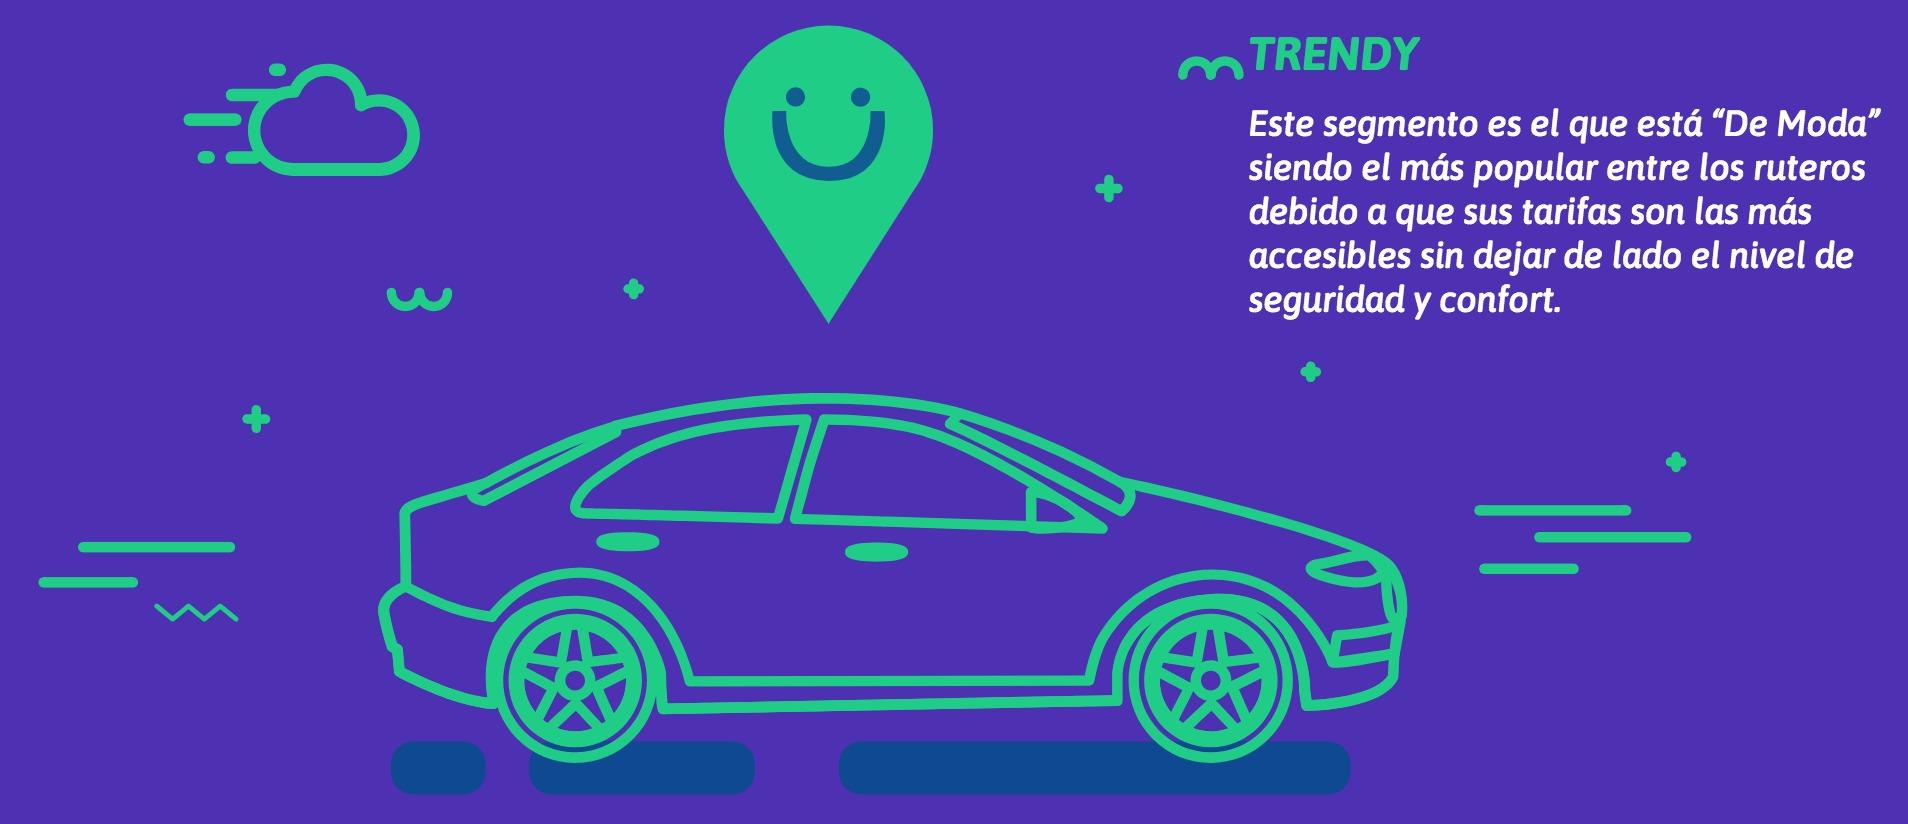 transporte Trendy